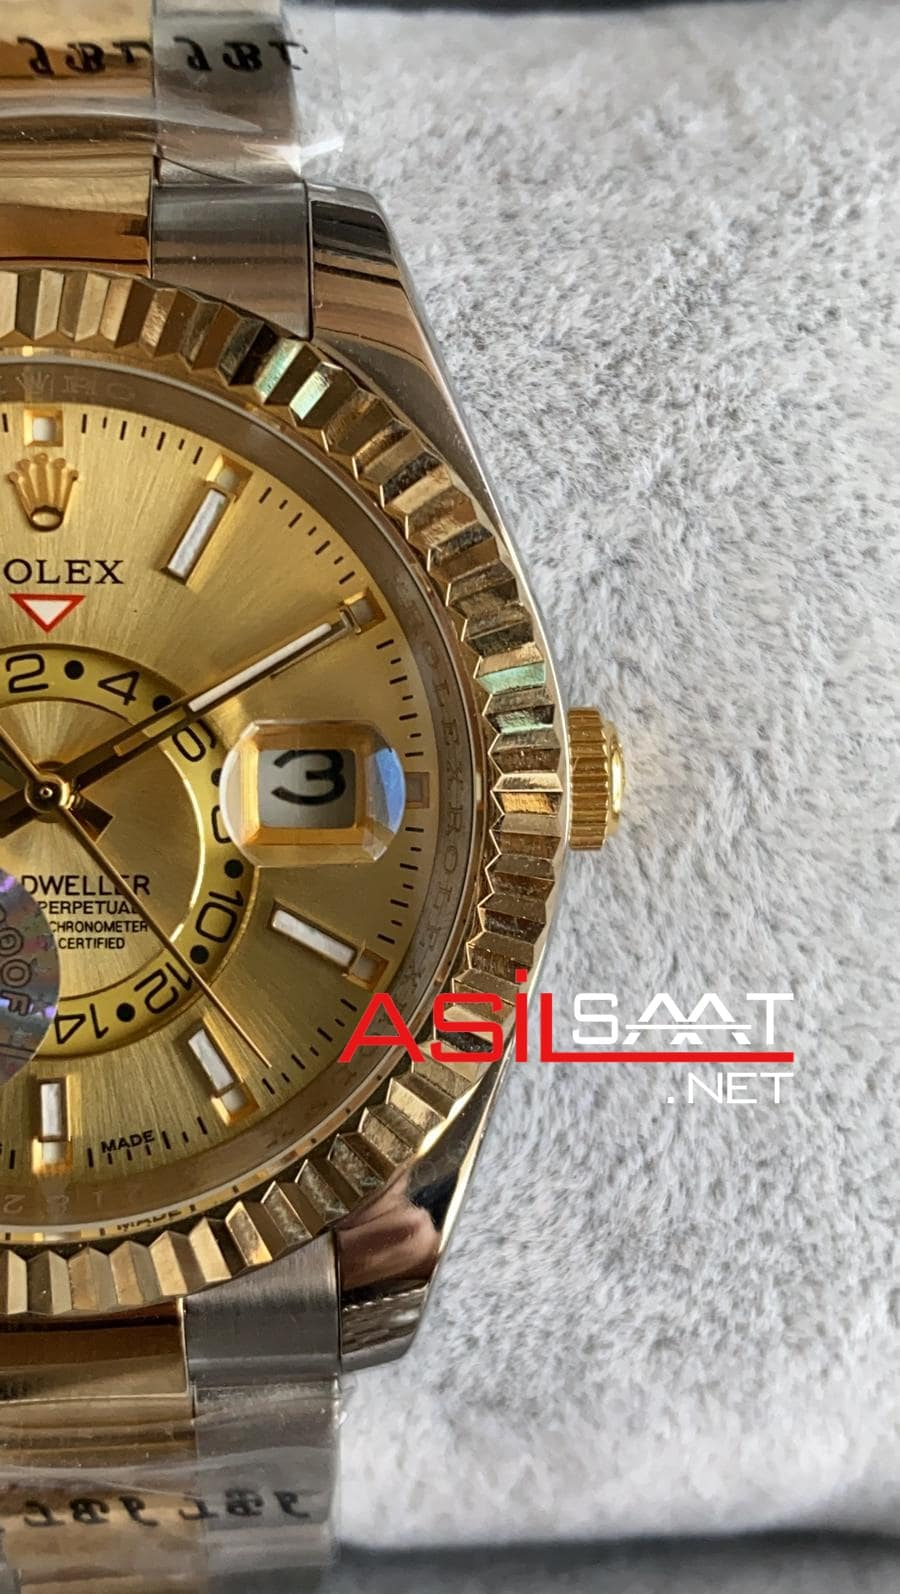 Rolex Oyster Perpetual Sky Dweller Two Tone Replika Saat ROLSKY008